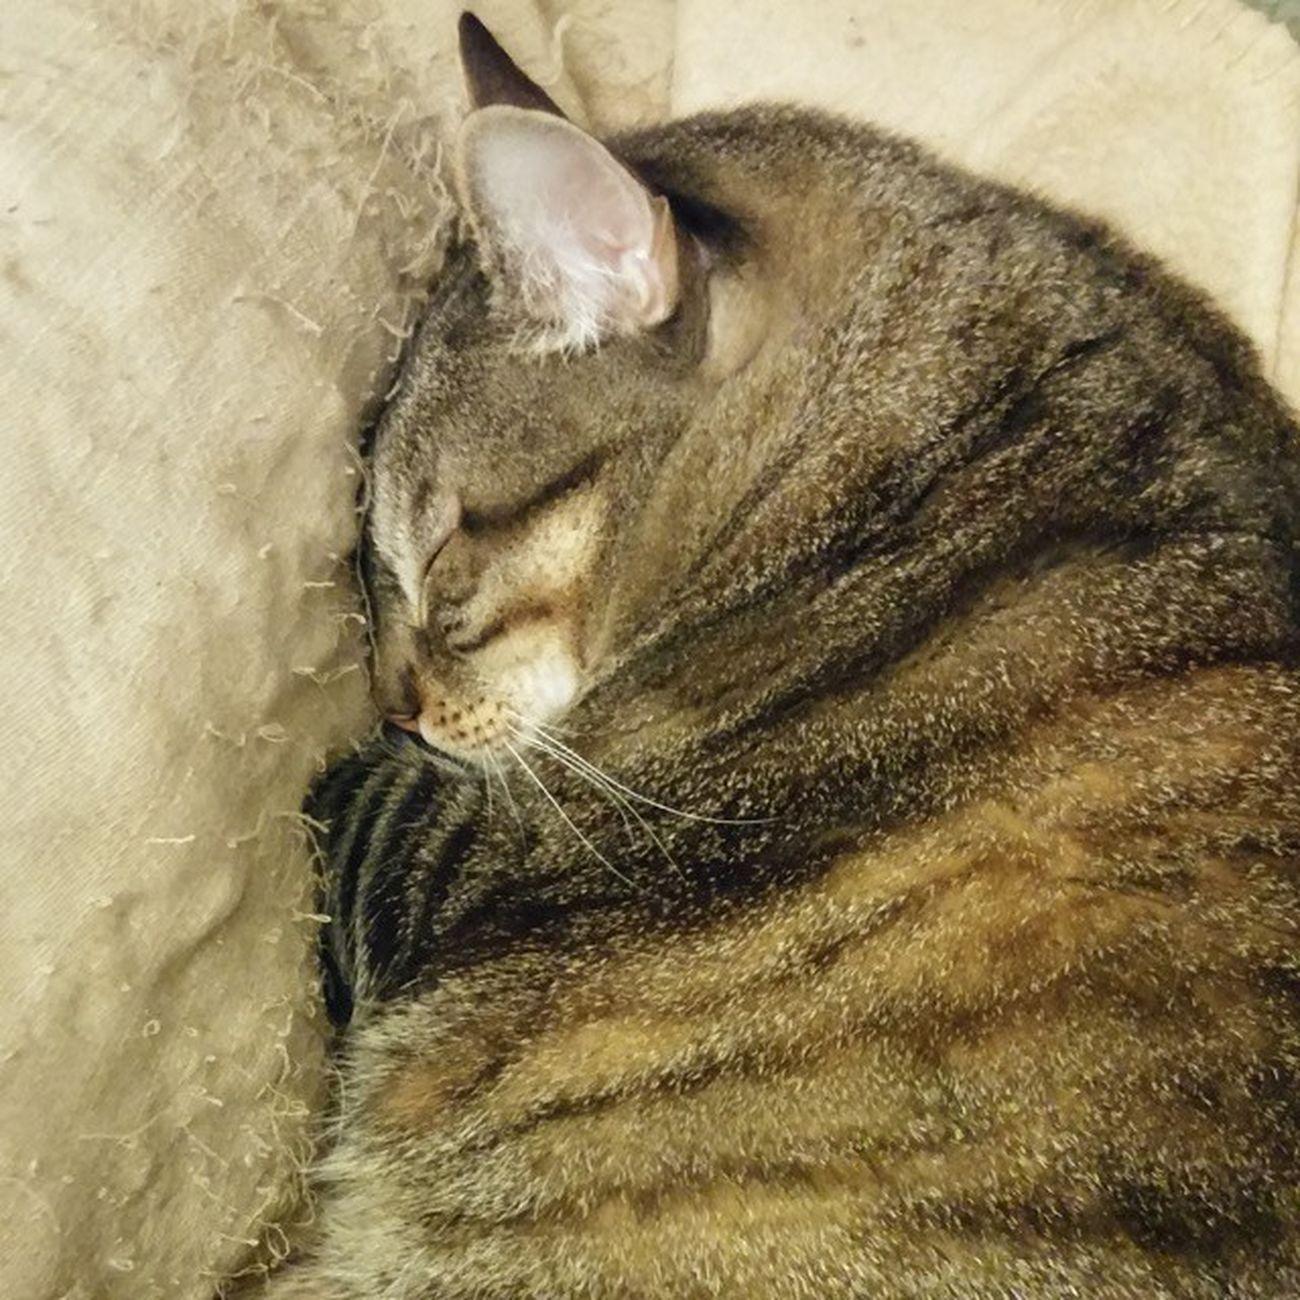 Cat Catsofinstagram Igerscats Sleepingcat Cute Pet TabbyCat Tabby Kali Barcelona World_kawaii_cat